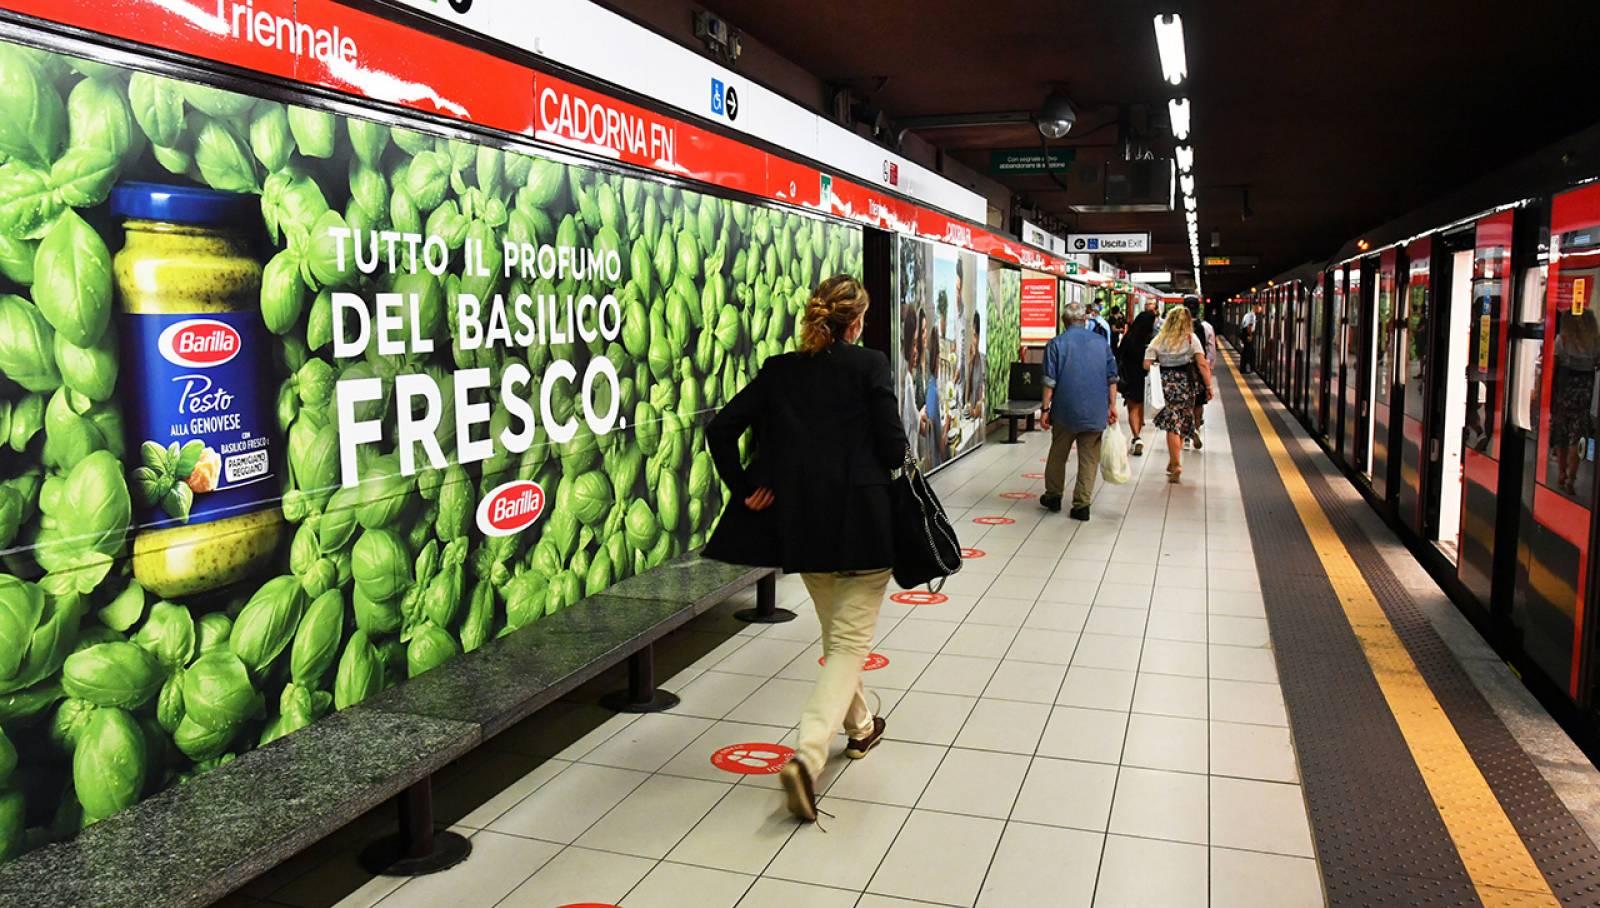 IGPDecaux OOH advertising Station Domination per Barilla Milano Cadorna